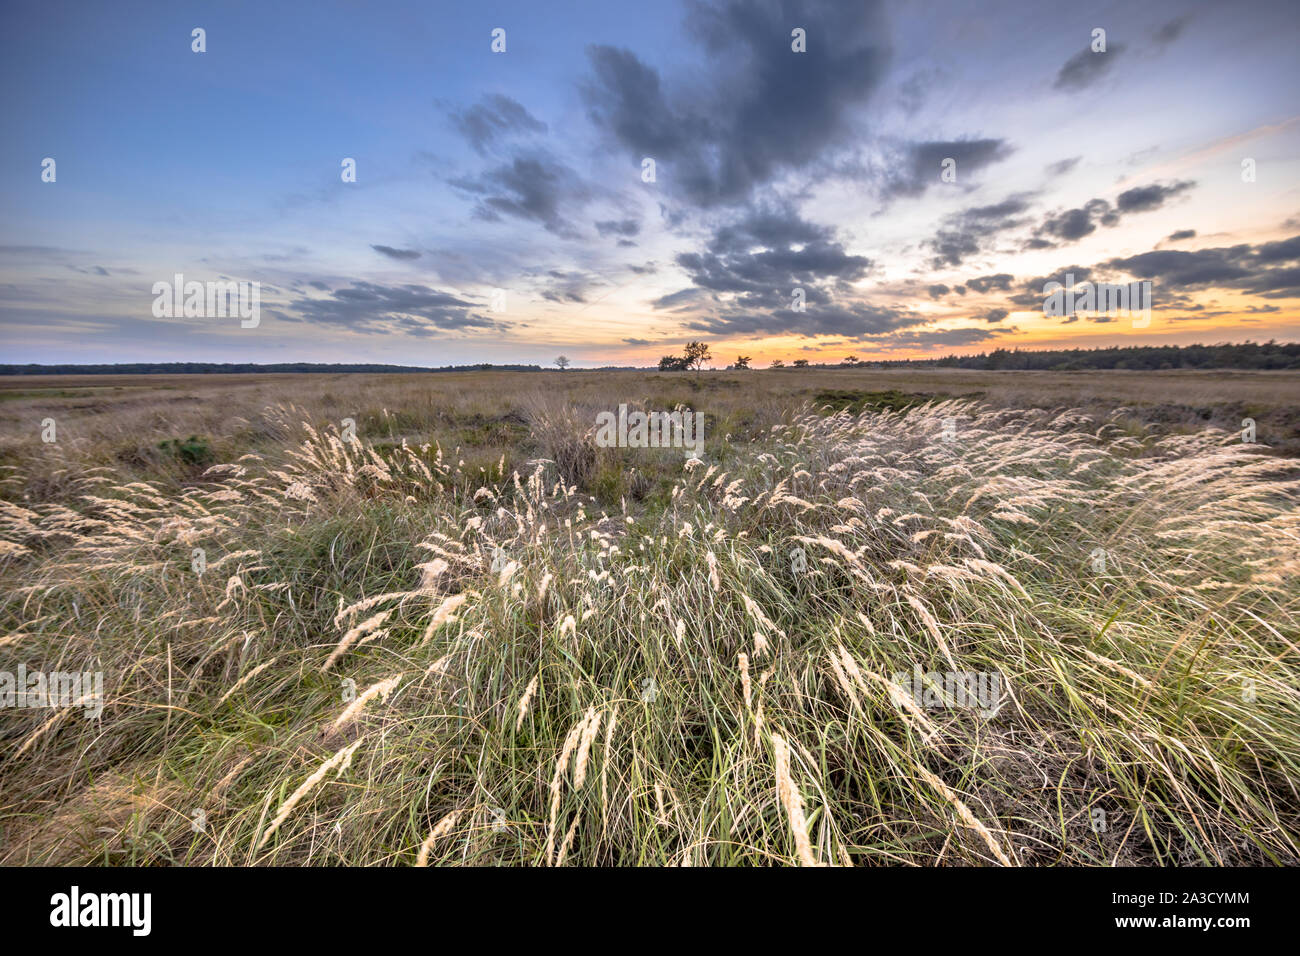 Natural heathland landscape with grass vegetation near Hijken in Province of Drenthe on beautiful summer evening in the Netherlands Stock Photo